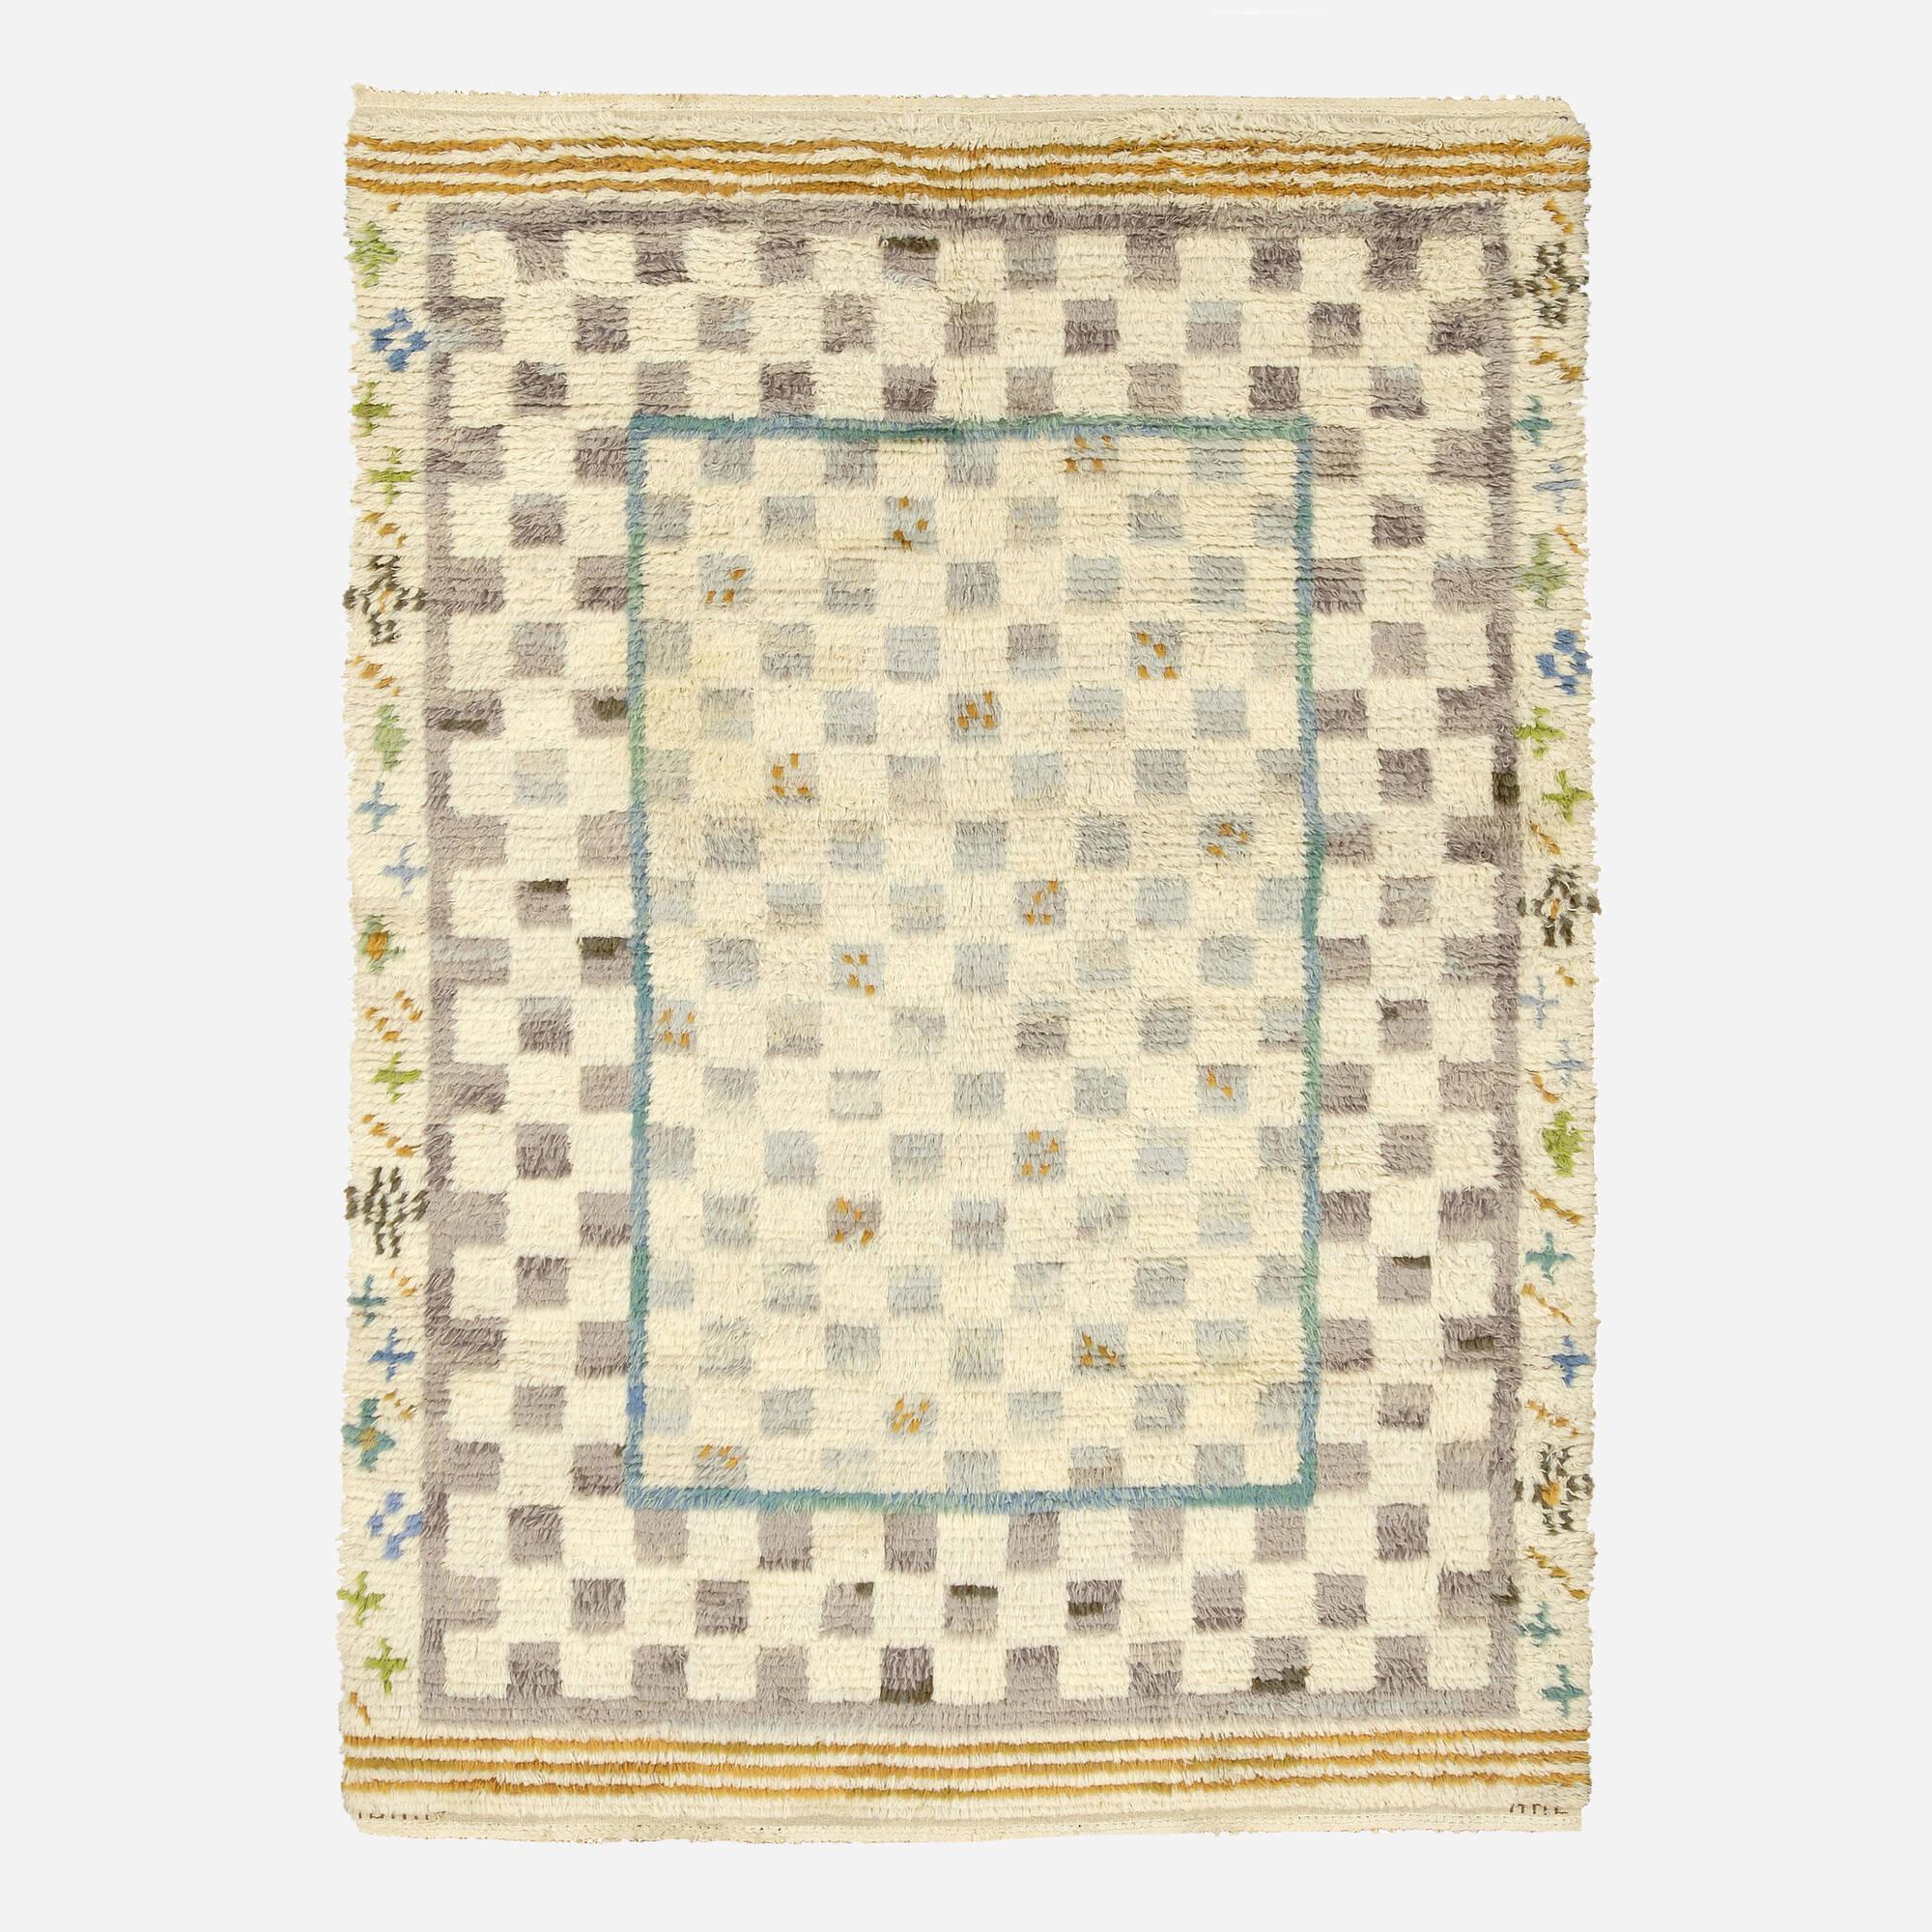 173: Ann-Mari Forsberg / Anna-Maris ljusa rya carpet (1 of 1)